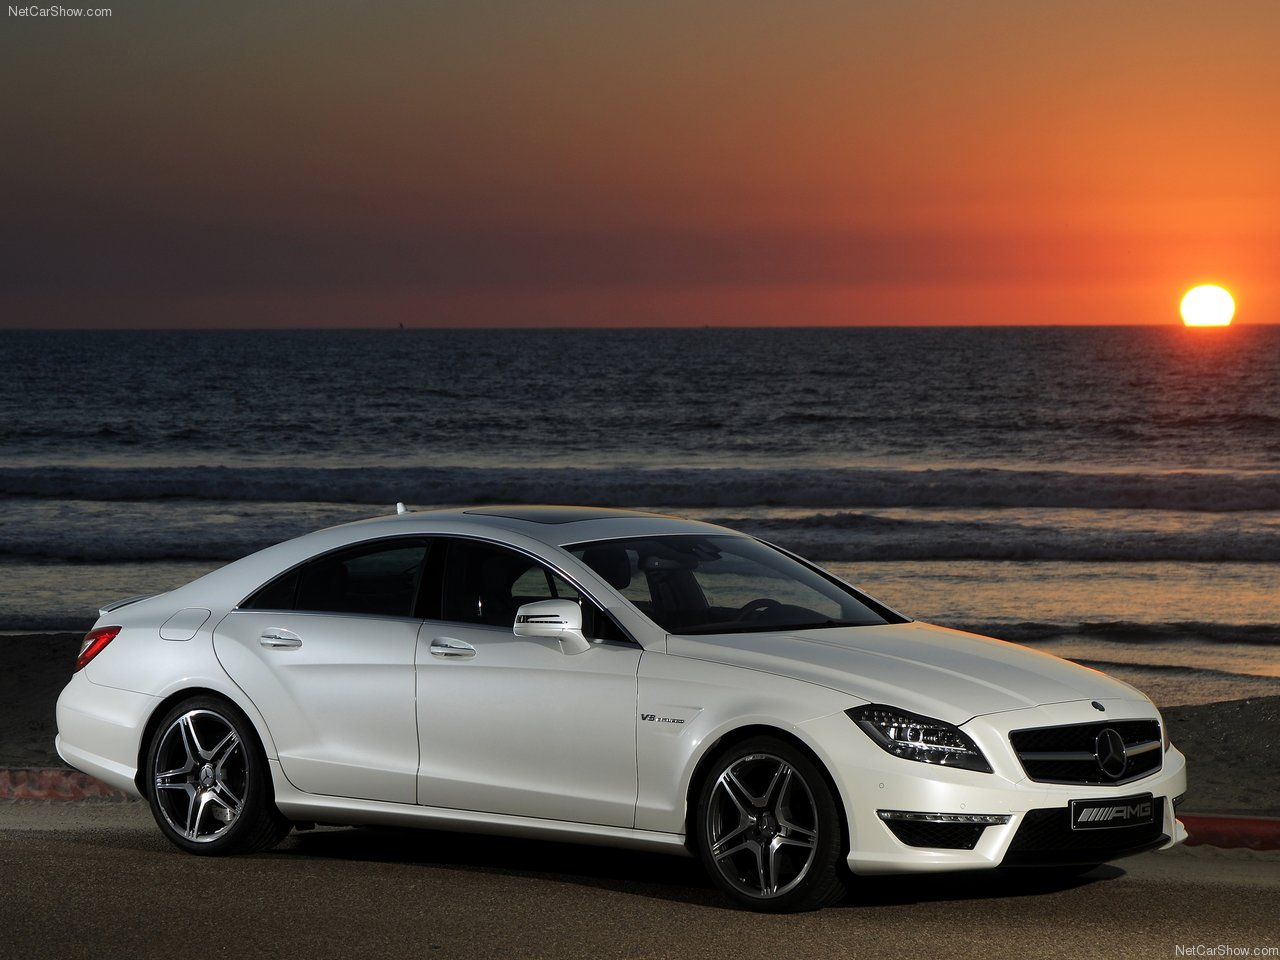 http://4.bp.blogspot.com/-LxZMrdFRXDI/TWib1OcFReI/AAAAAAAAK1Y/EaaIAslWzaw/s1600/Mercedes-Benz-CLS63_AMG_US_Version_2012_1280x960_wallpaper_03.jpg